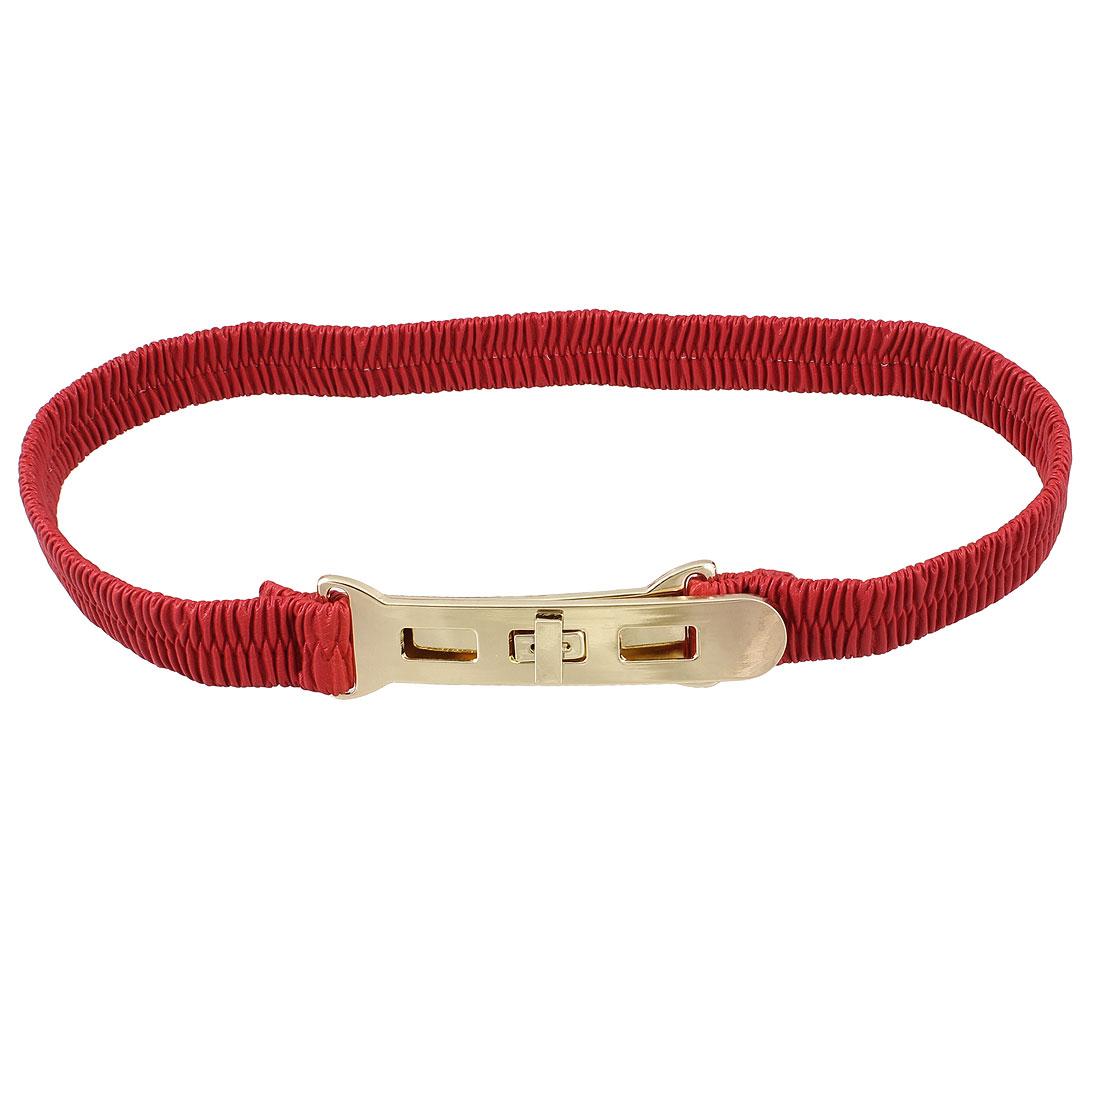 Metal Turn Lock Buckle Red Elastic Waist Cinch Belt for Lady